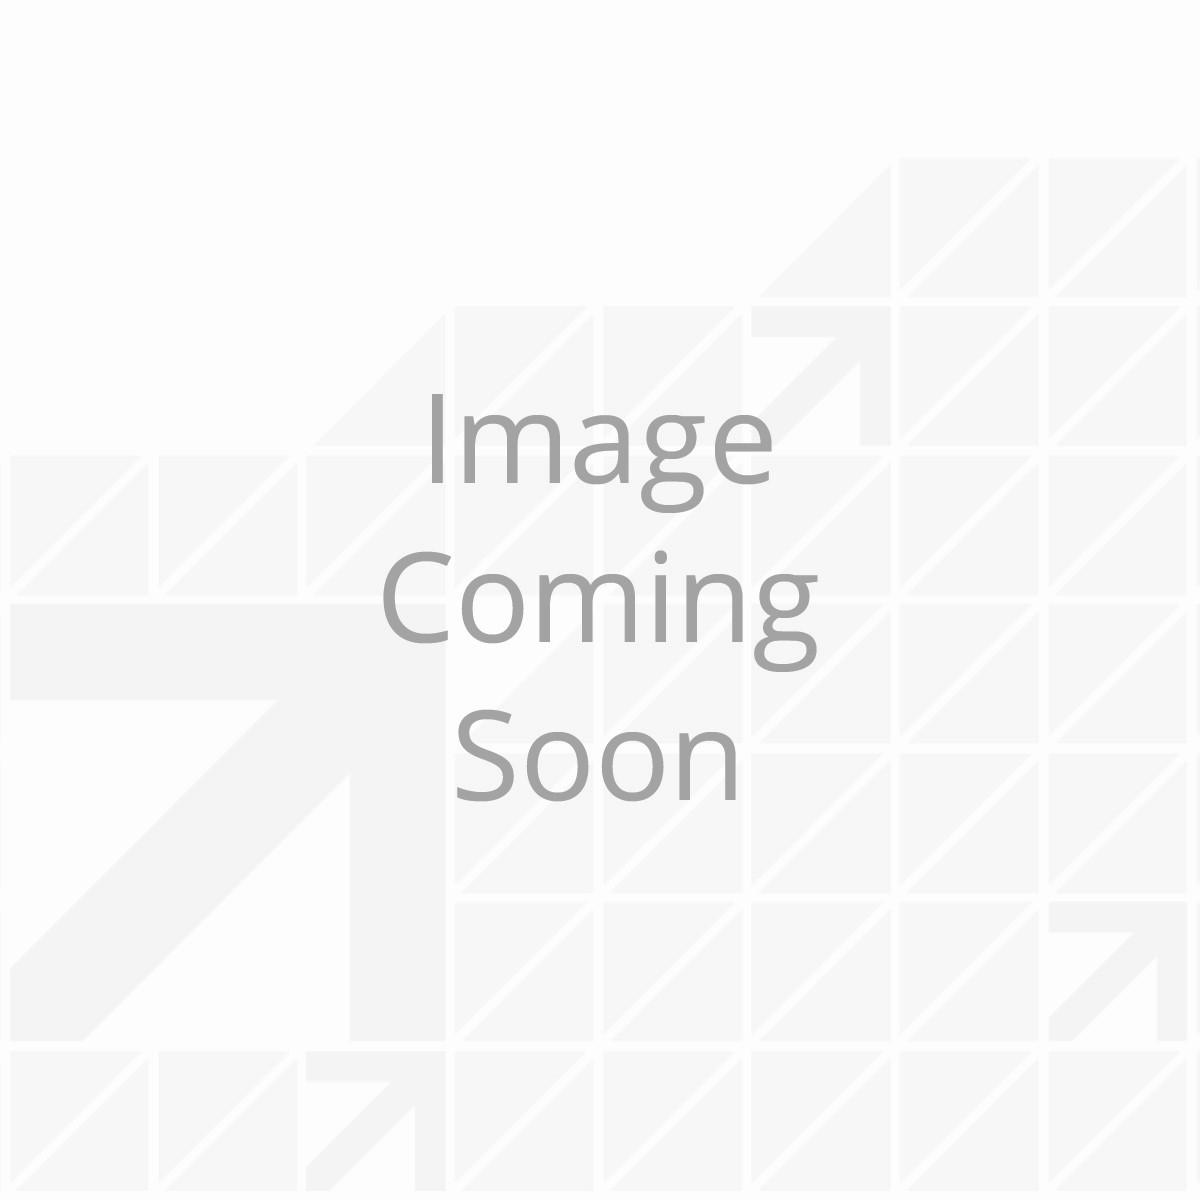 149663_Control-Module_002